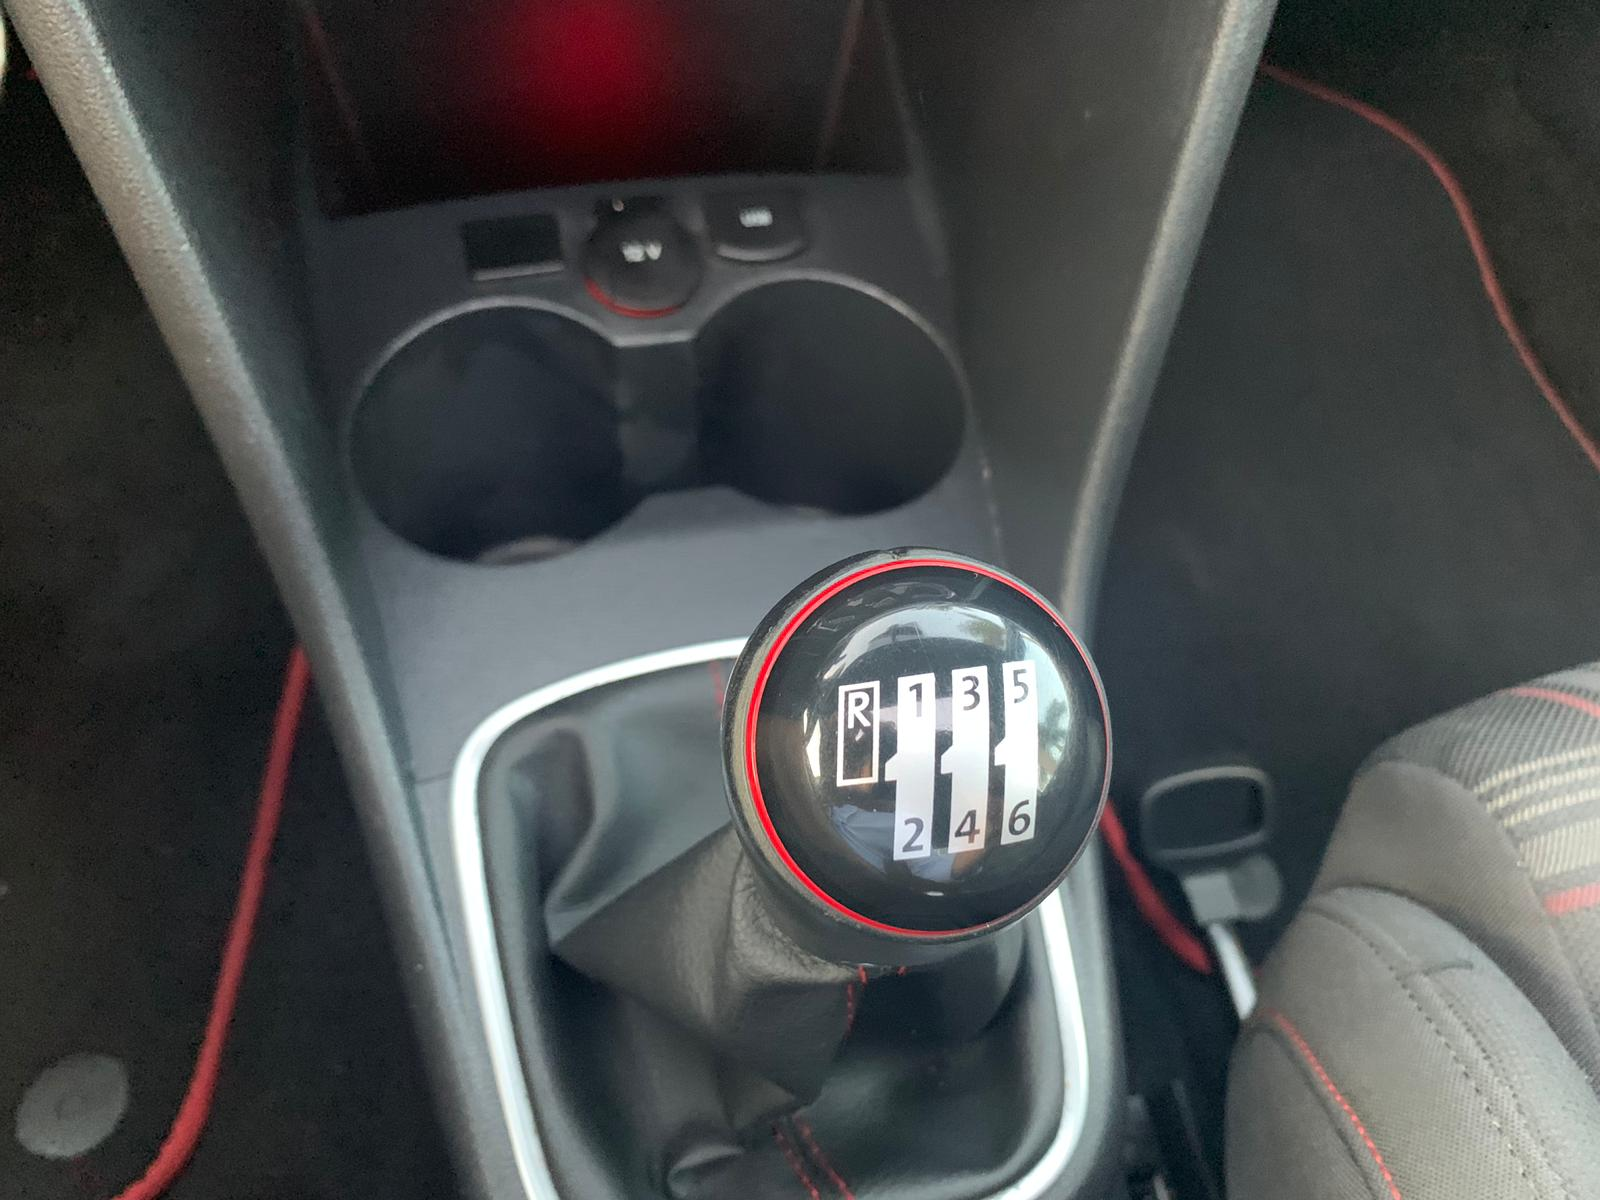 POLO GTI 1.9TSI 190 CV 2015 SEP19 (14)